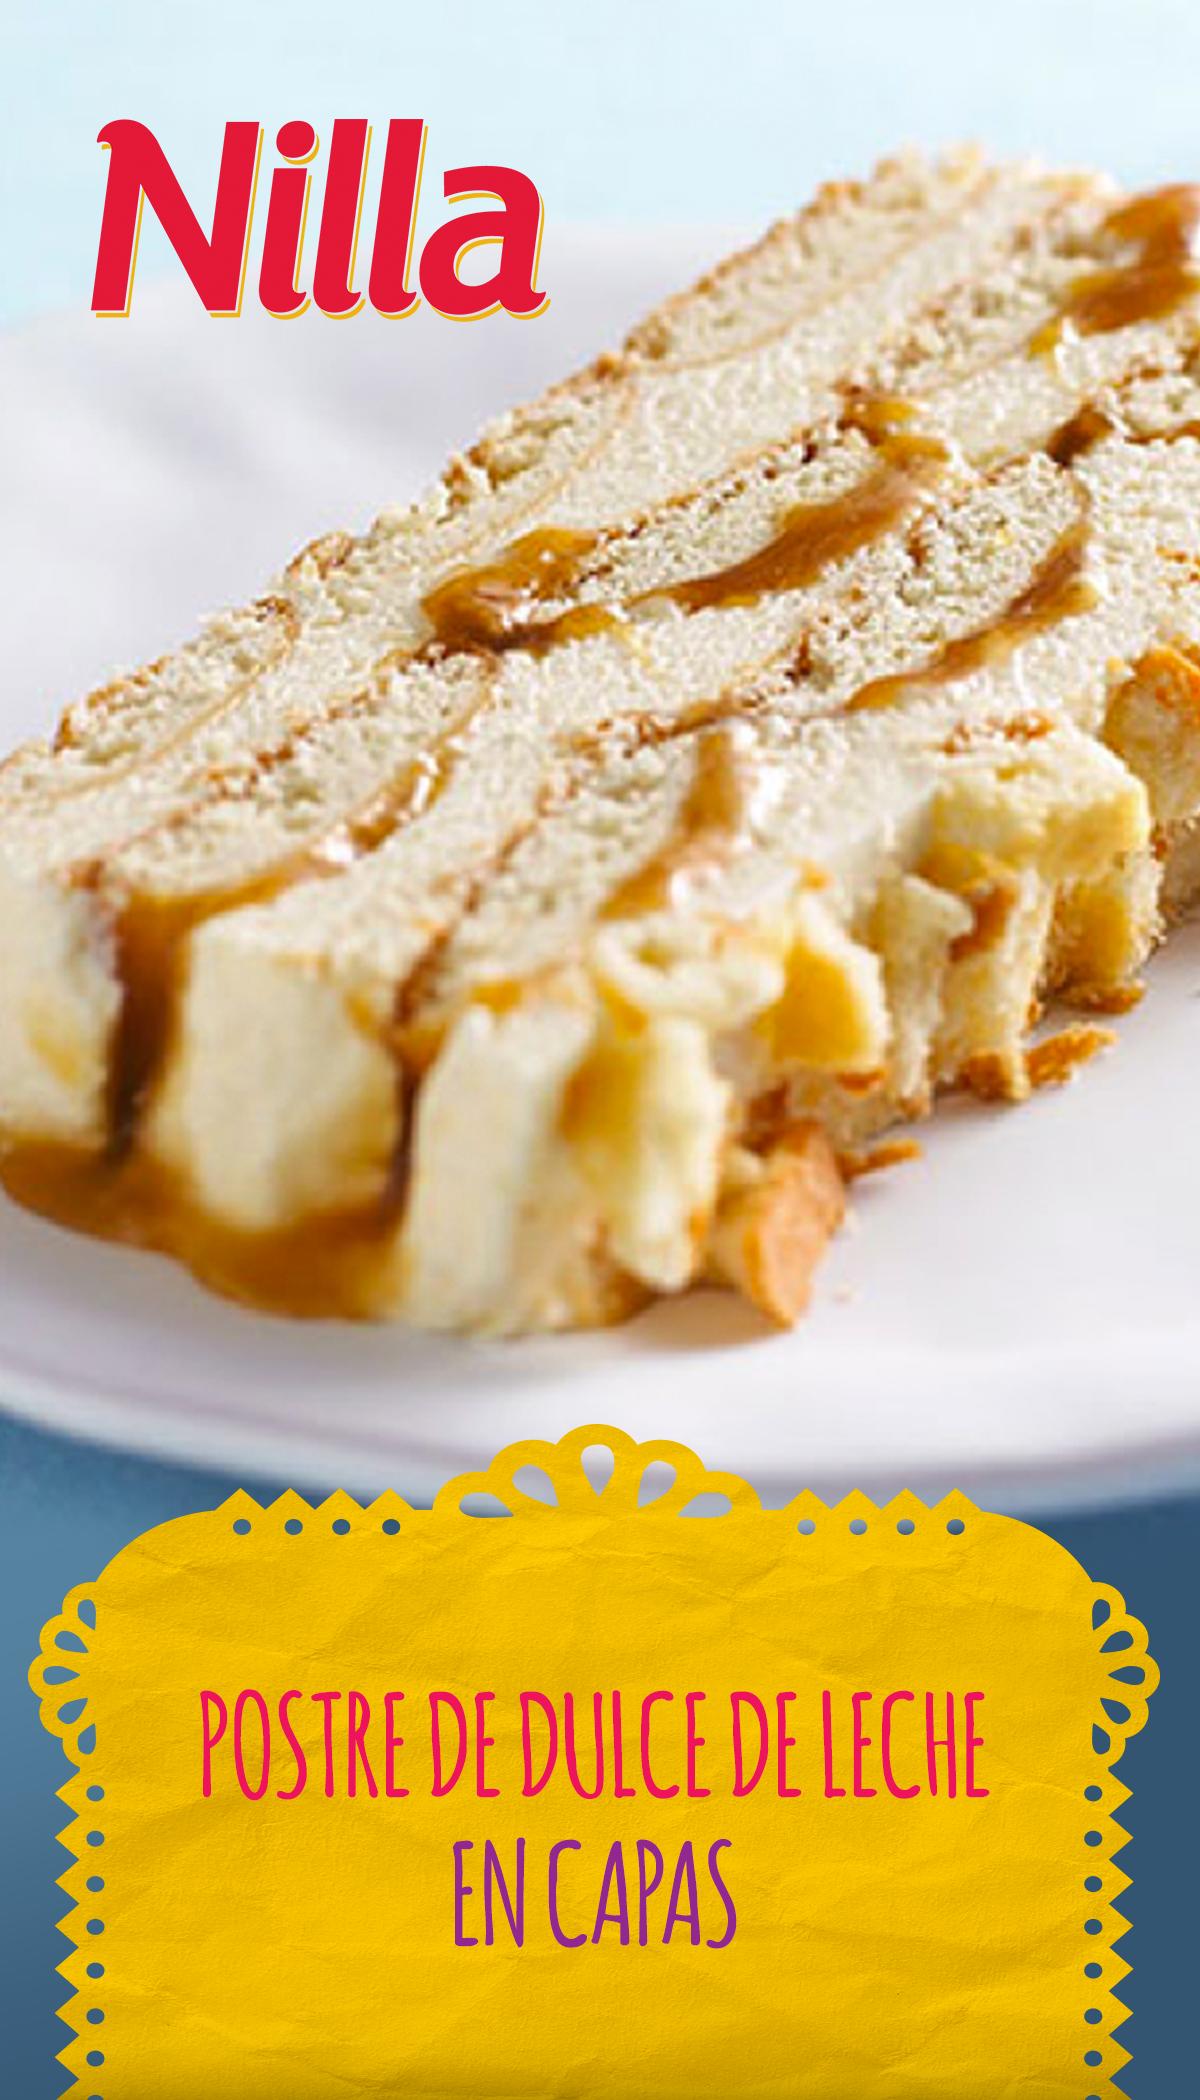 Postre de dulce de leche en capas #ad #LetsMerienda #LatinaBloggers #recetas #MHH